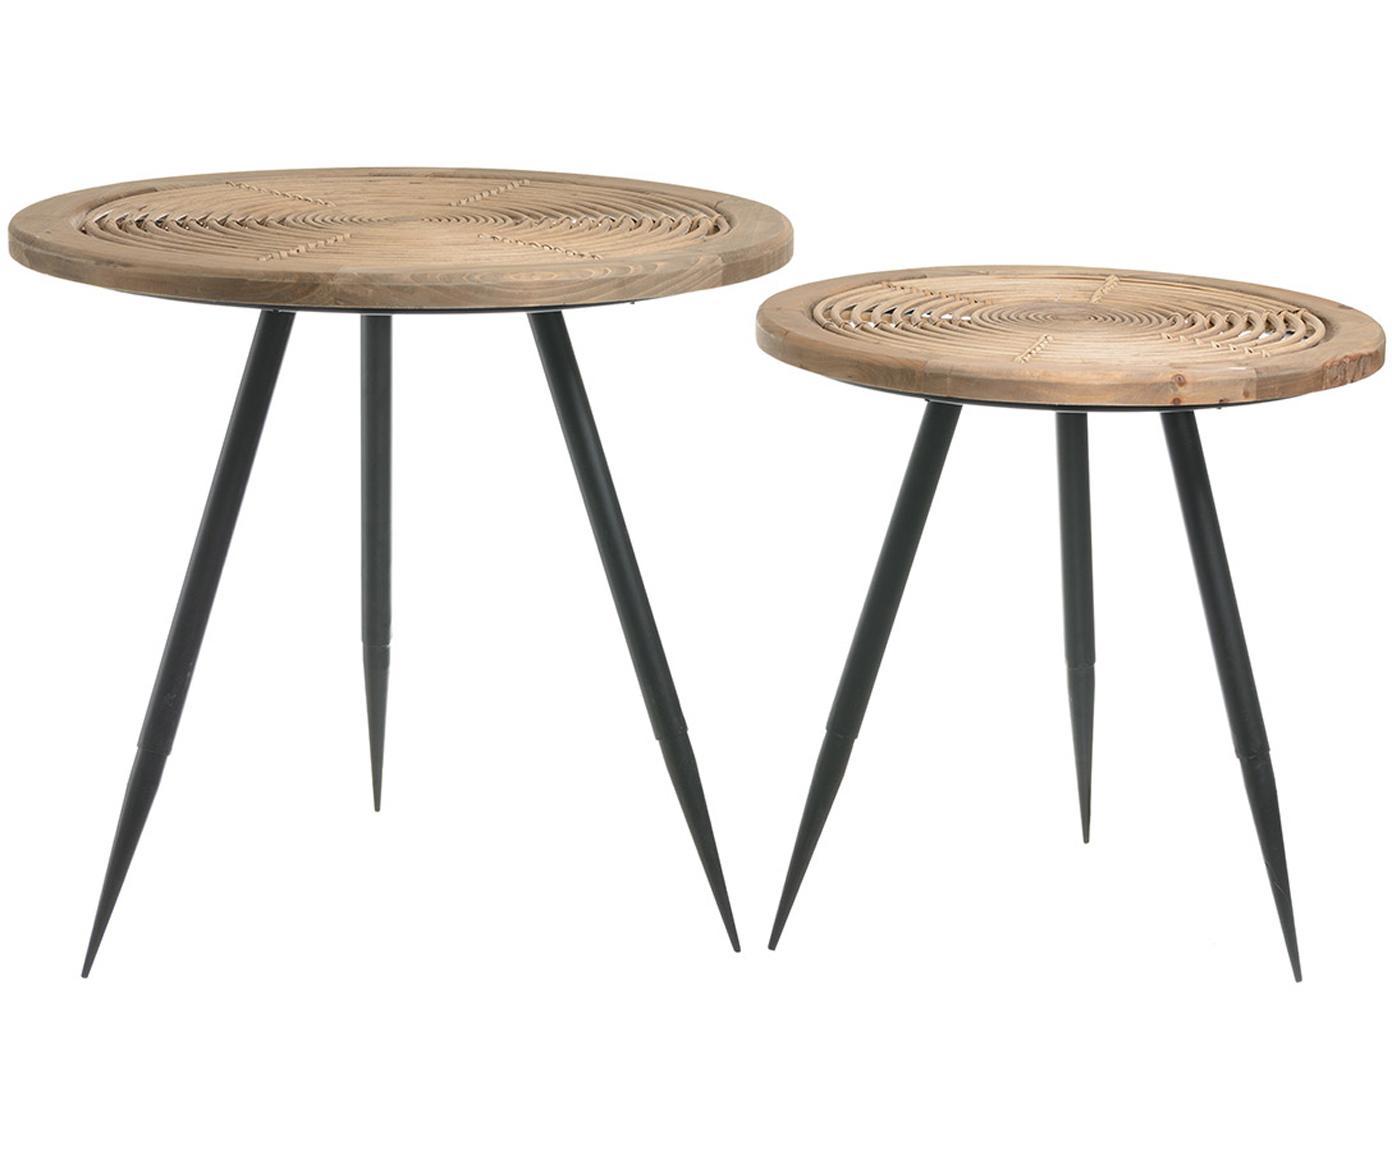 Set de mesas auxiliares Rinni, 2uds., Tablero: fibra natural, madera, Patas: metal, Beige, negro, Ø 61 x Al 57 cm